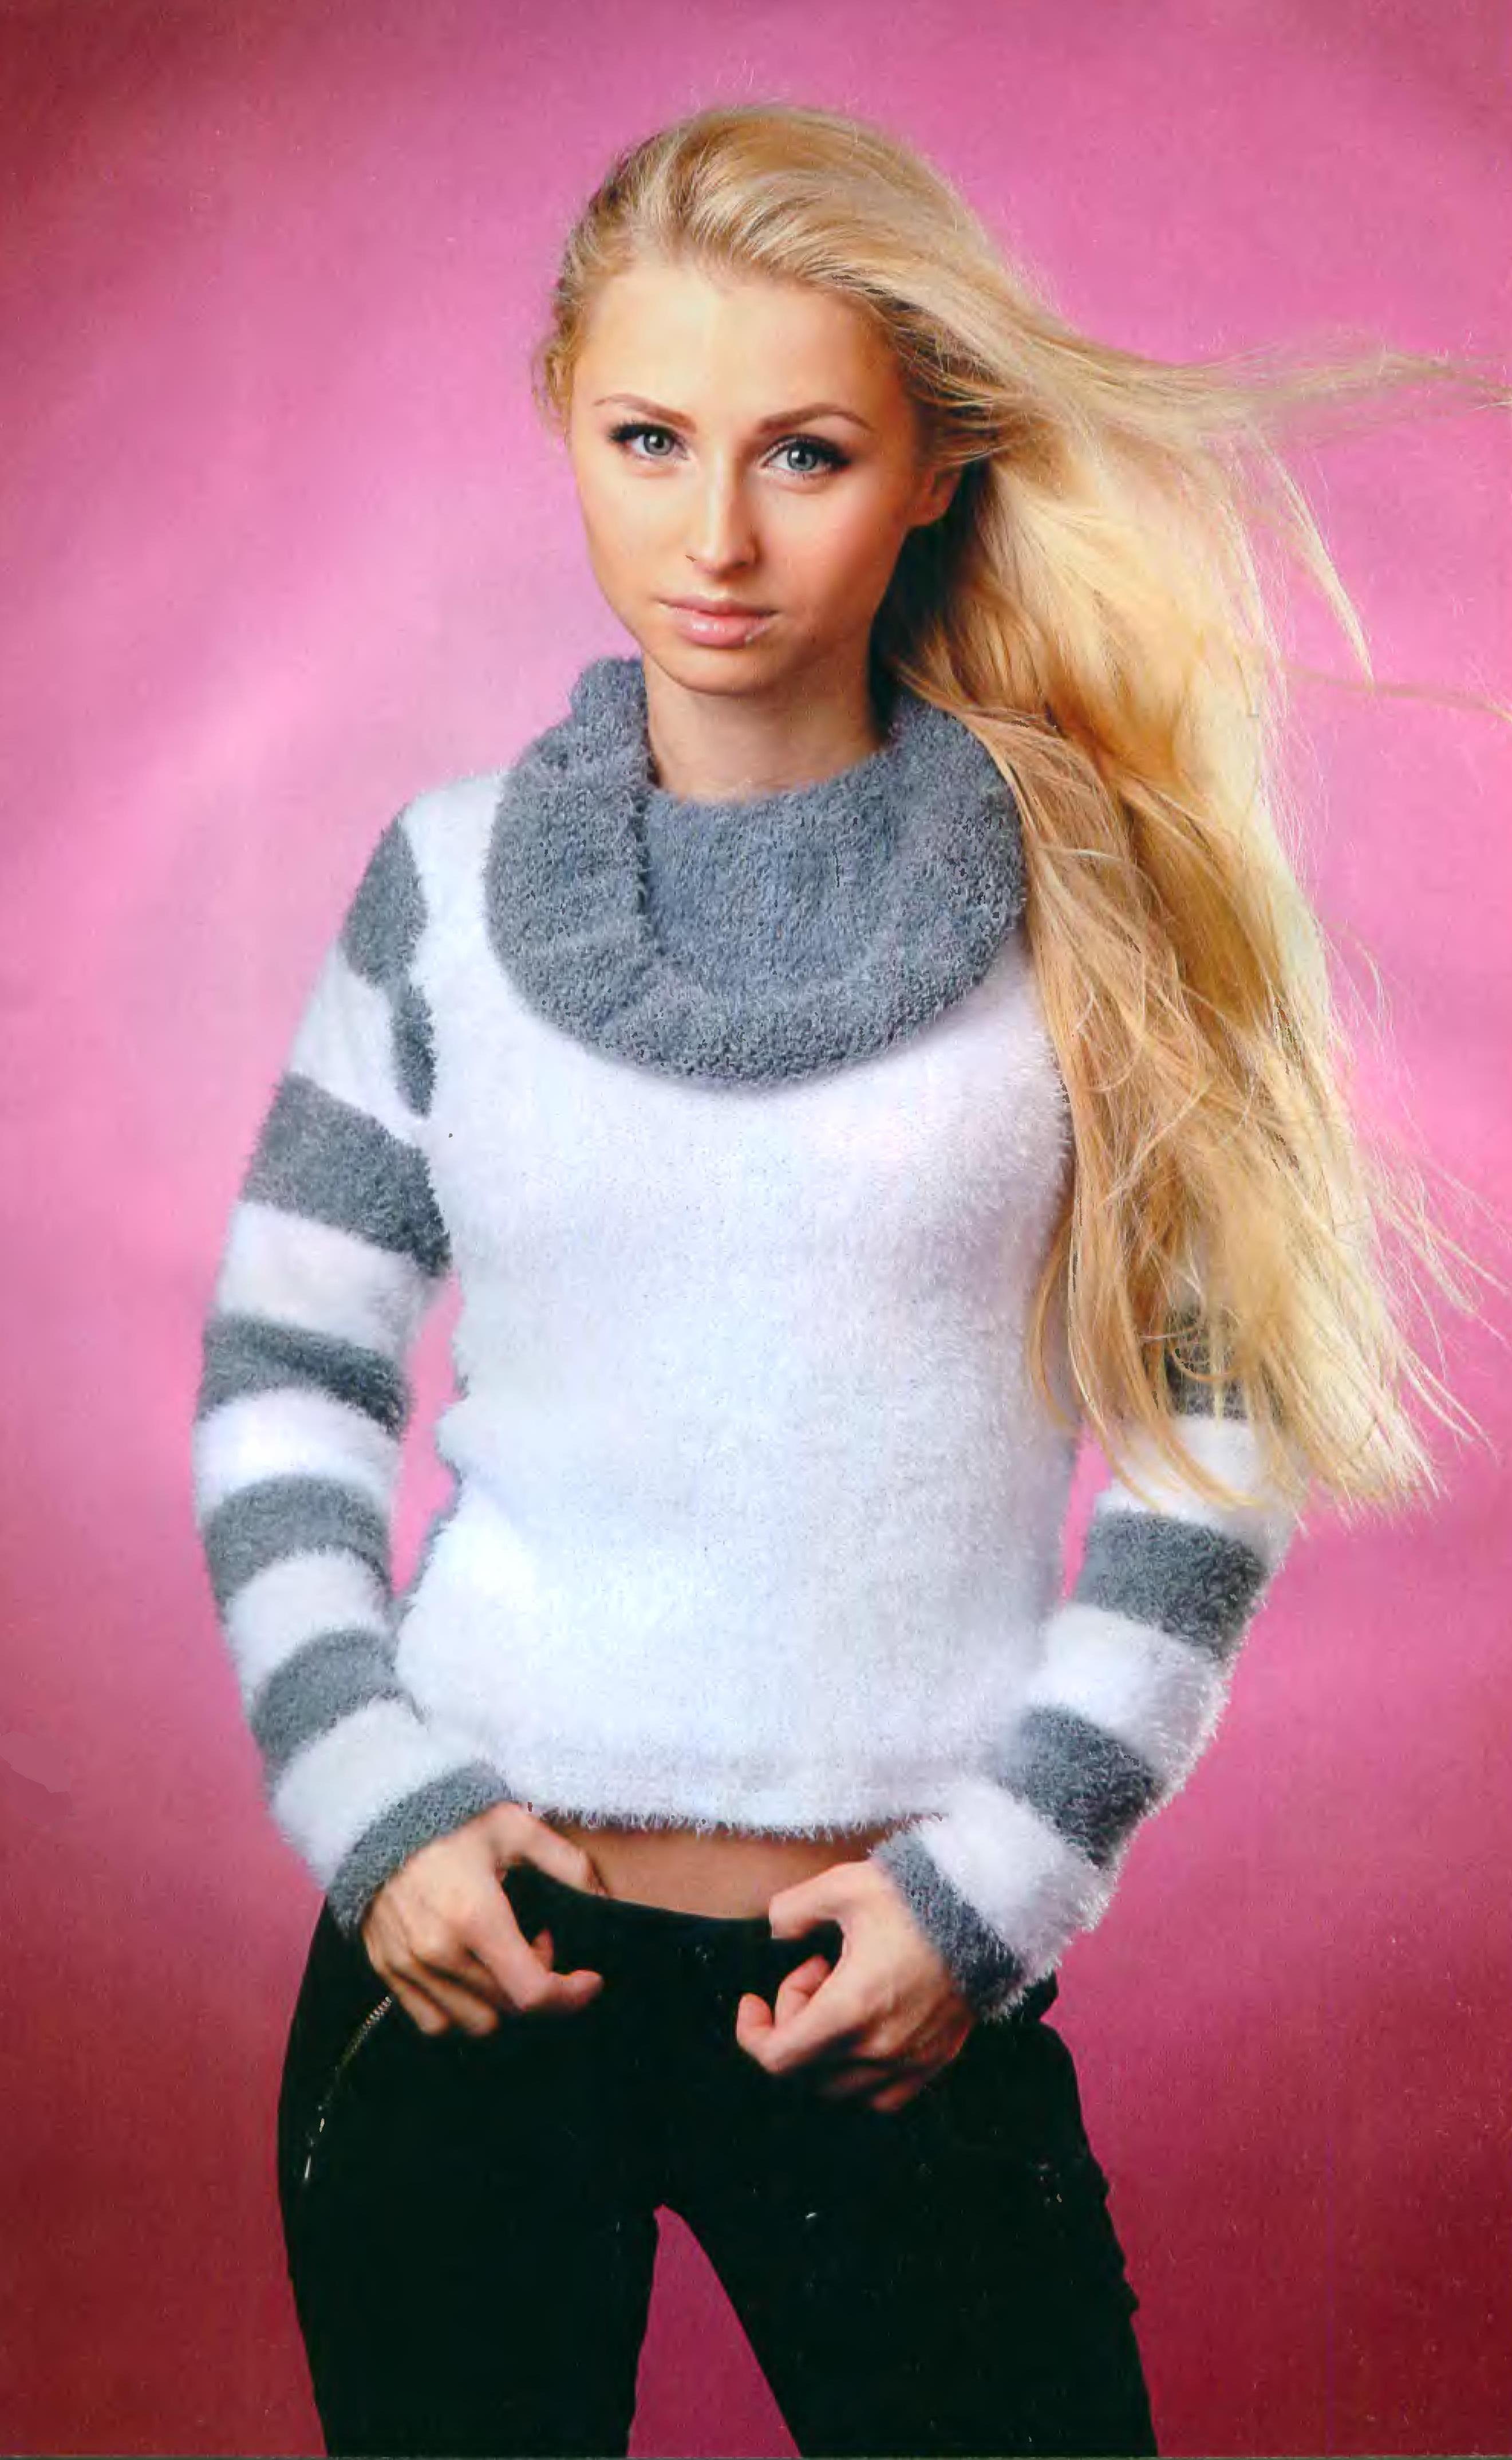 Бело - серый пуловер вязаный спицами